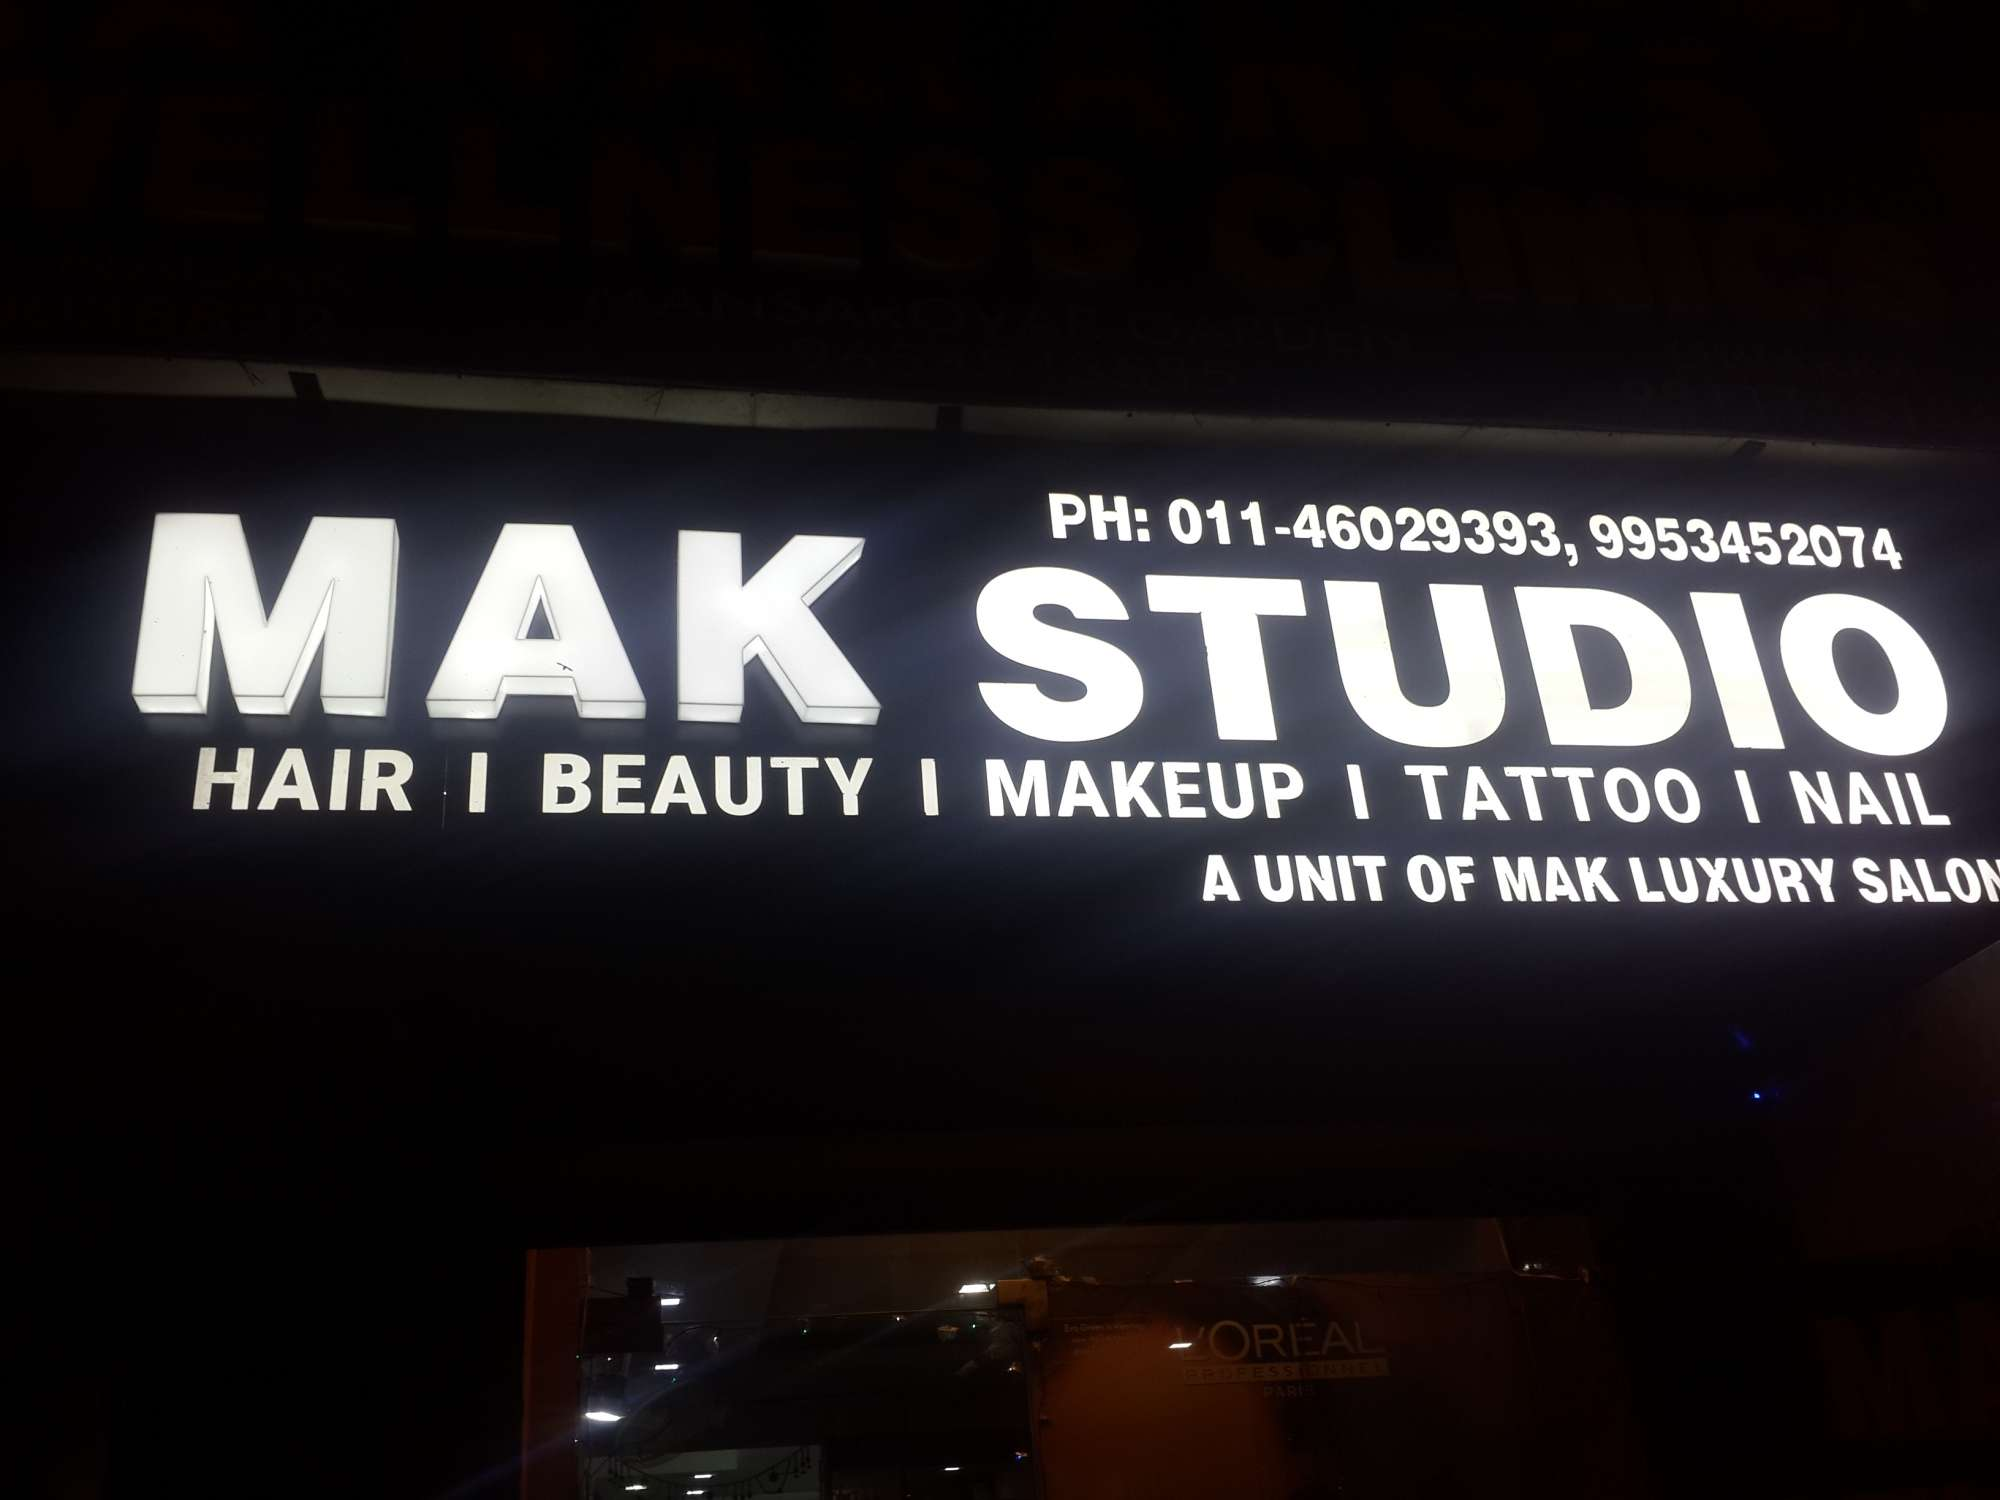 Mak Studio, Mansarover Garden - Mac Studio - Beauty Parlours For Nail Art  in Delhi - Justdial